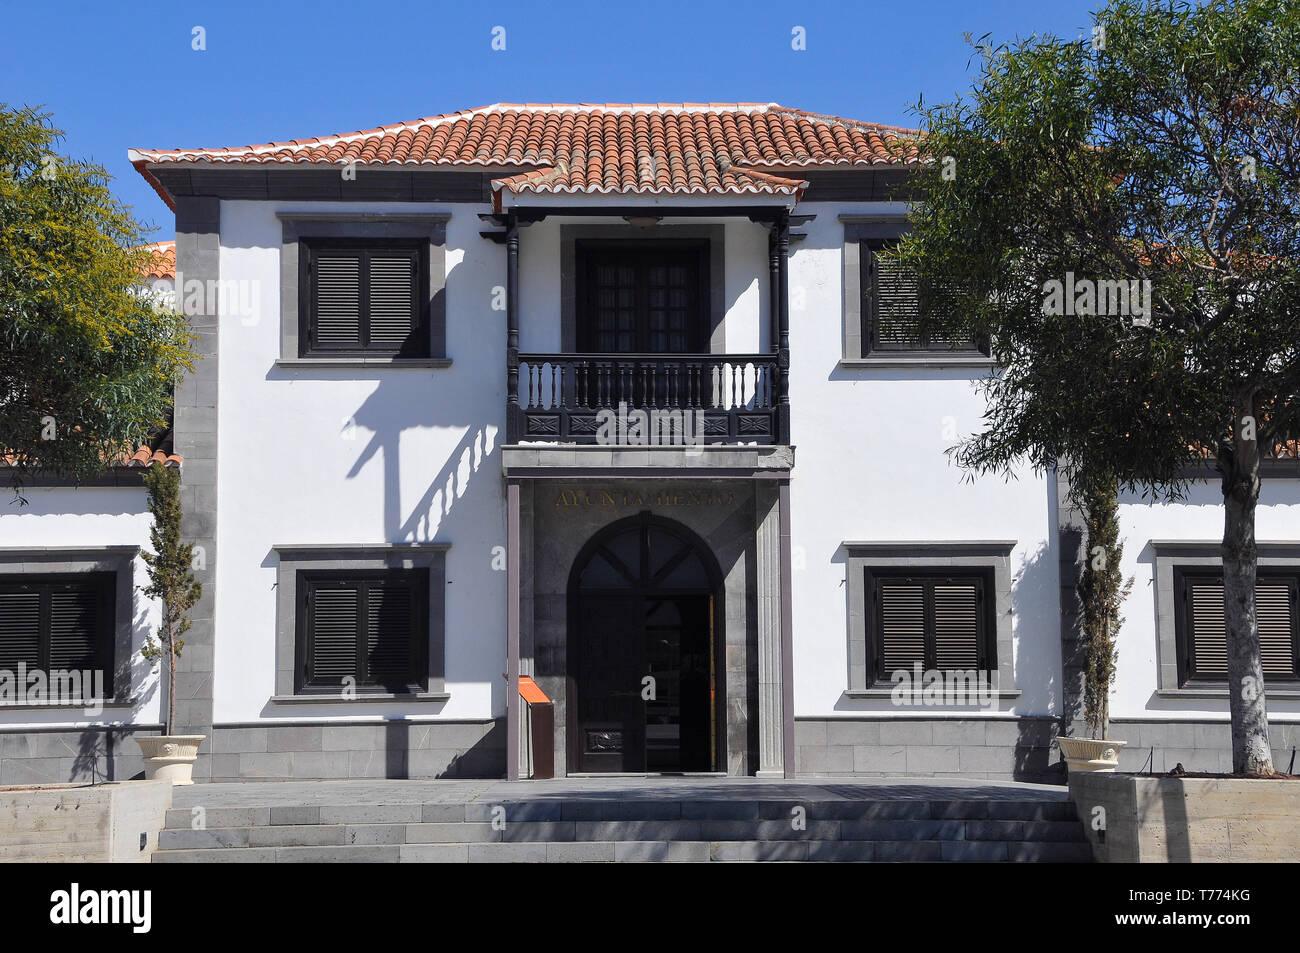 Haus in Santiago del Teide, Teneriffa, Kanarische Inseln, Spanien Stockbild